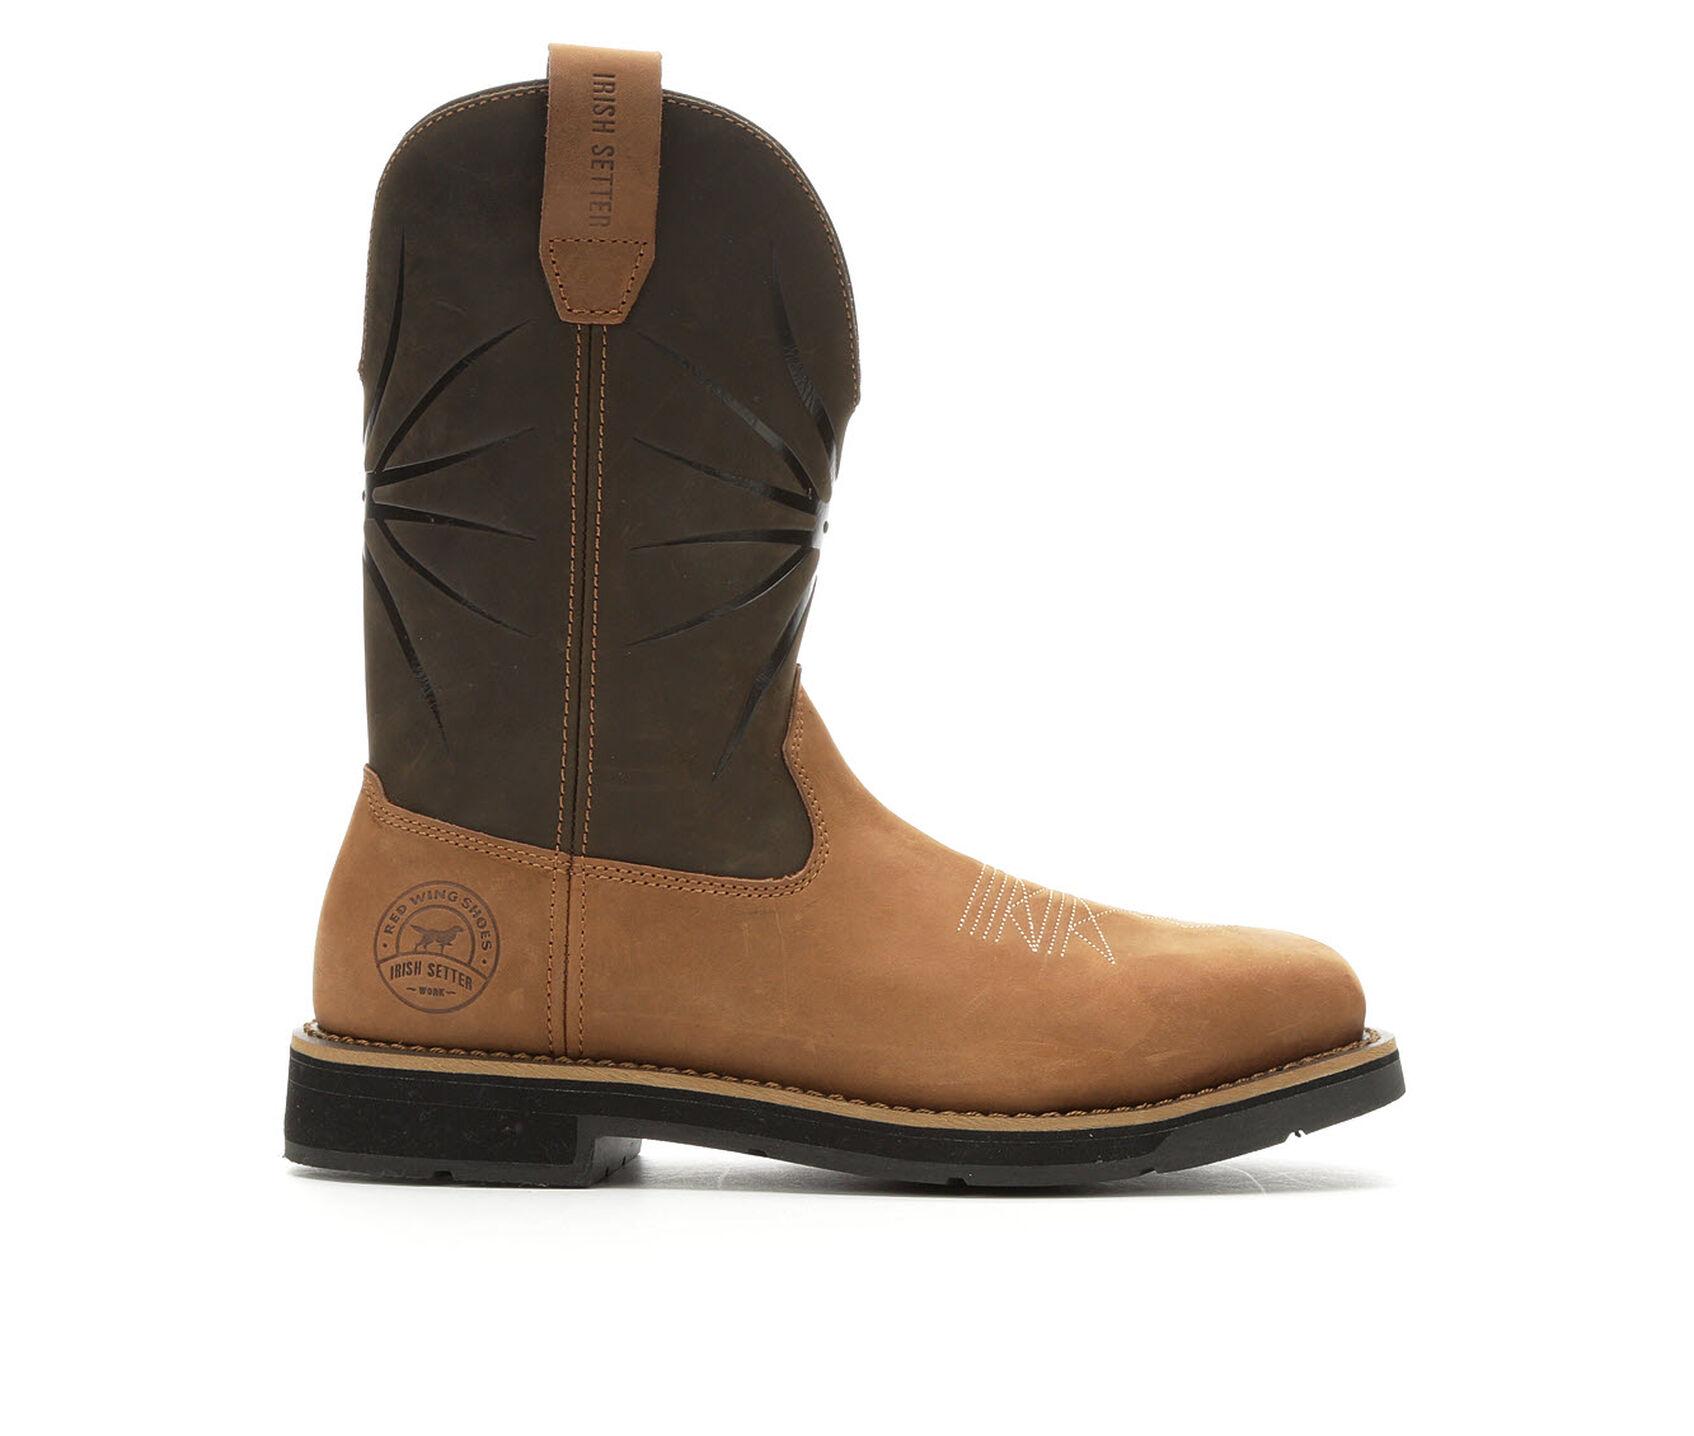 74023019c5c Men's Red Wing-Irish Setter Walker Steel Toe Work Boots